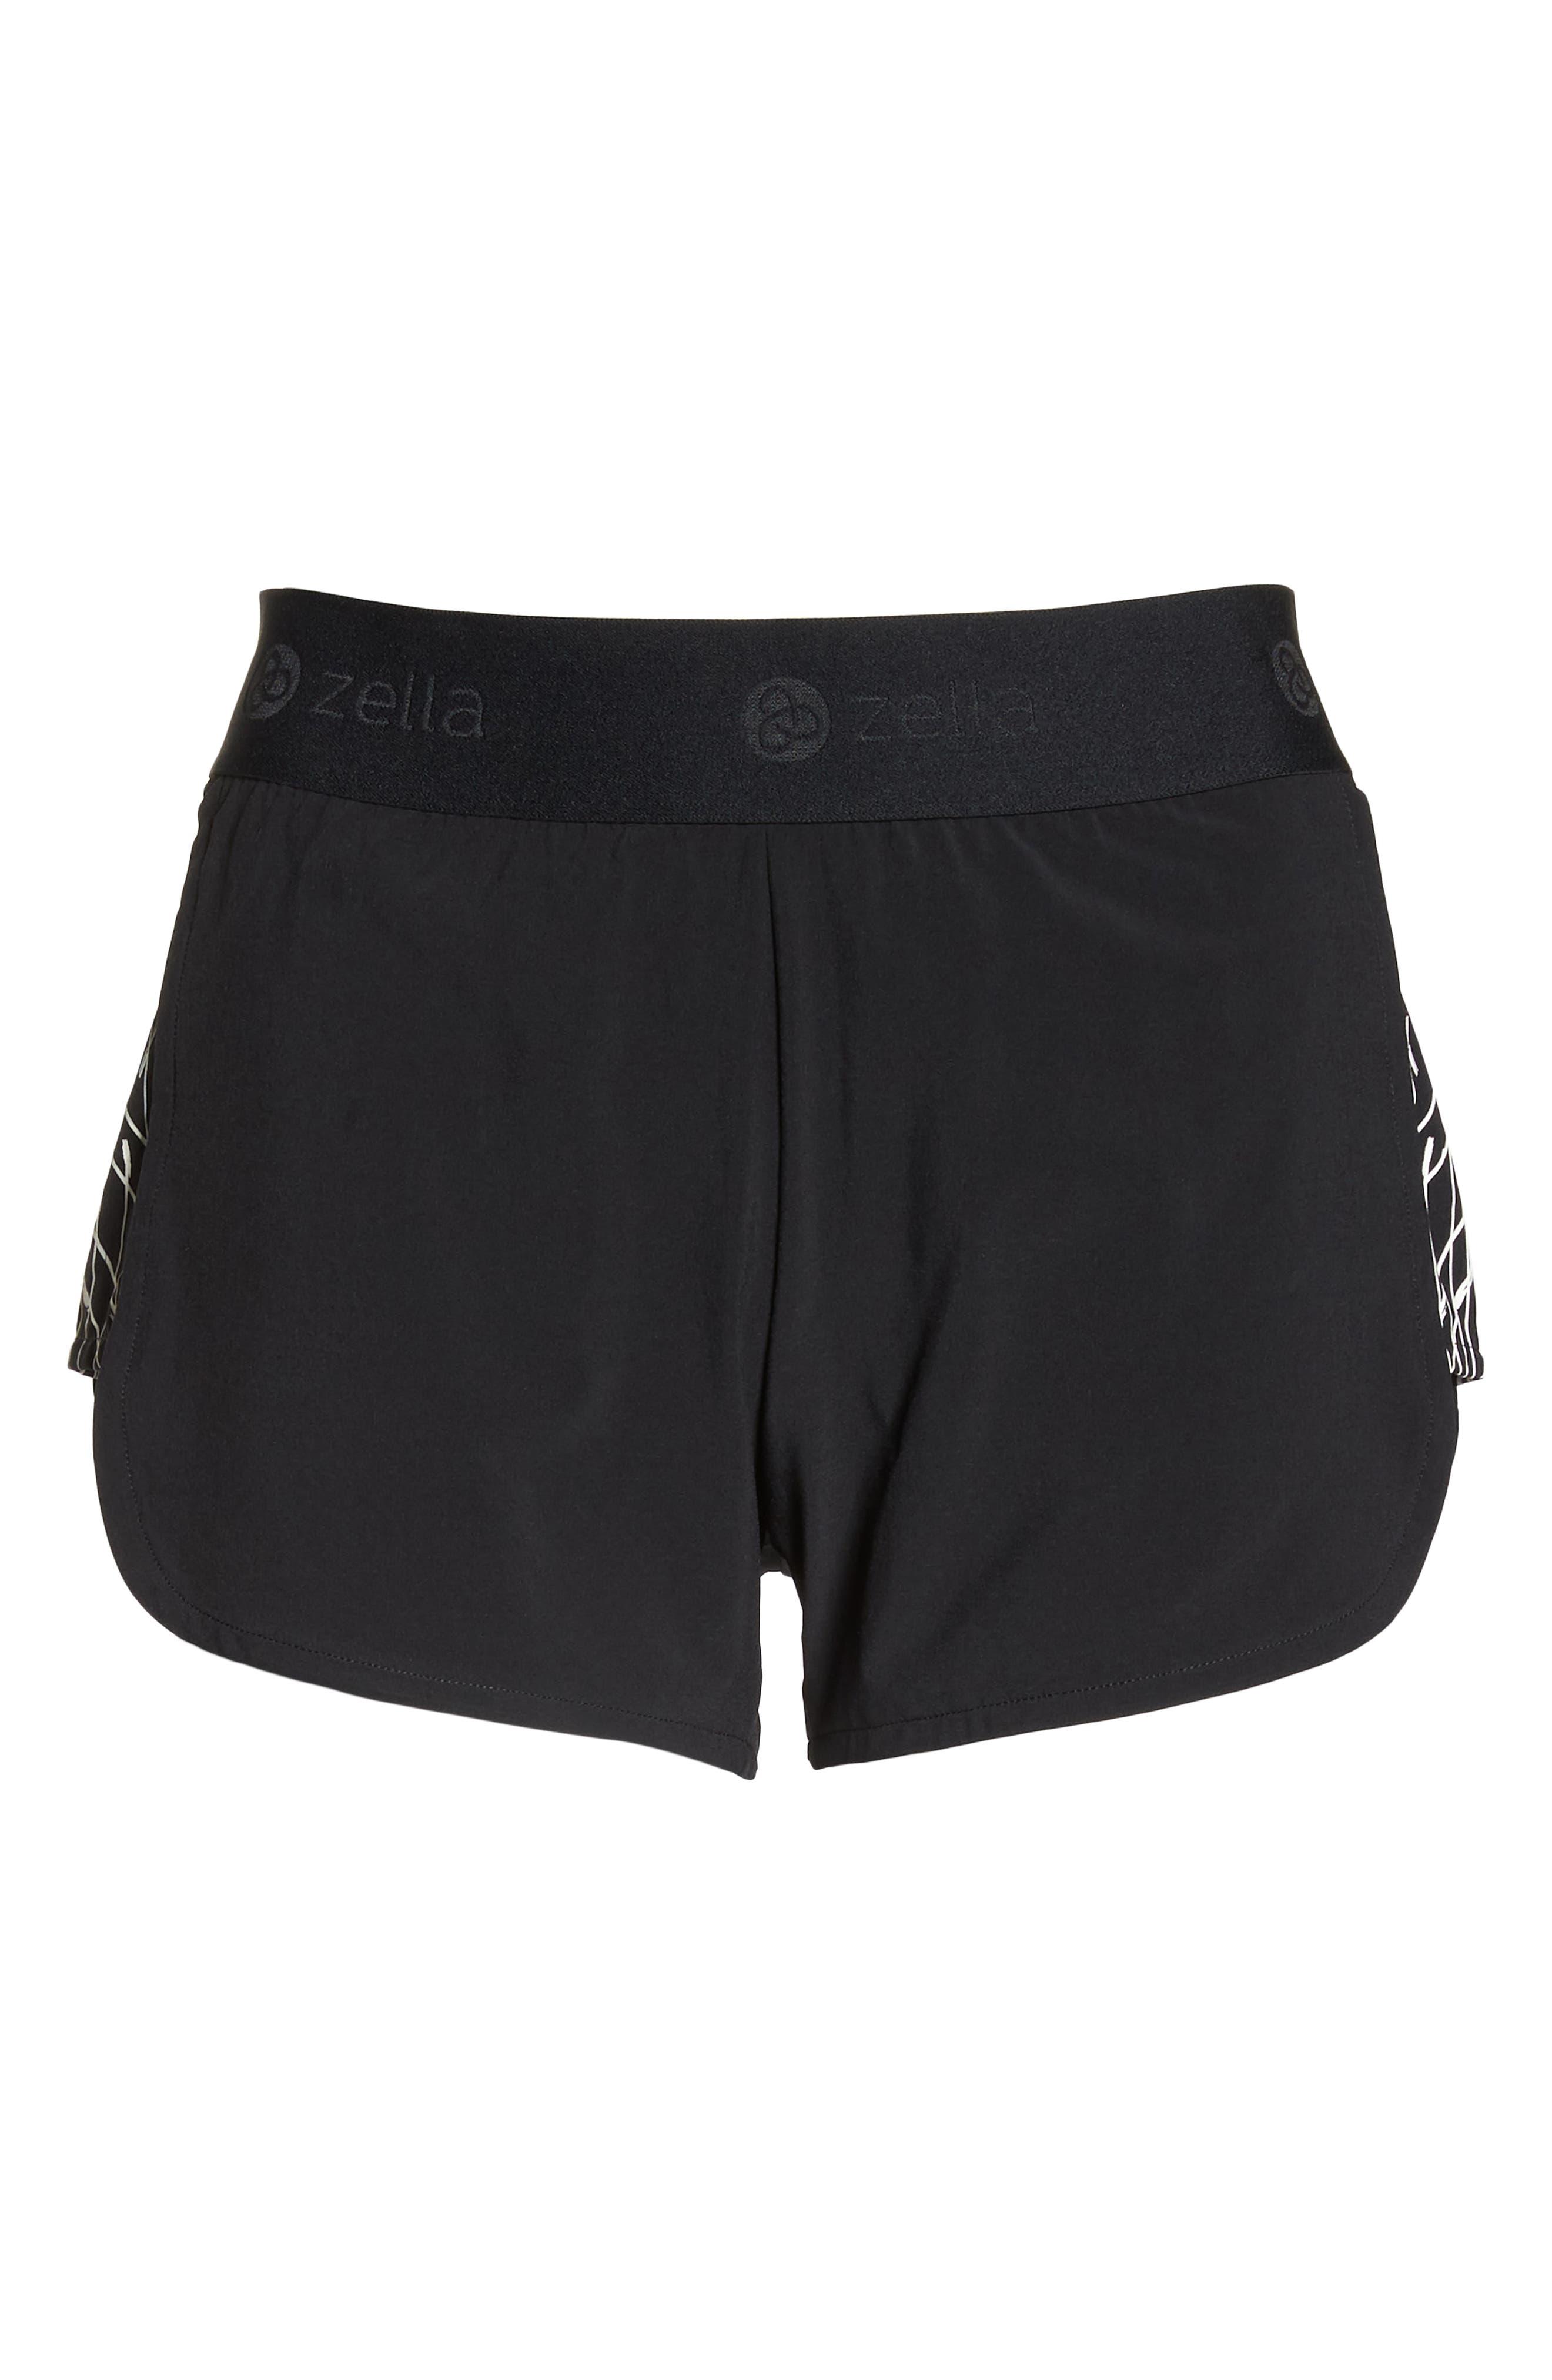 Go Run Reflect Shorts,                             Alternate thumbnail 7, color,                             001